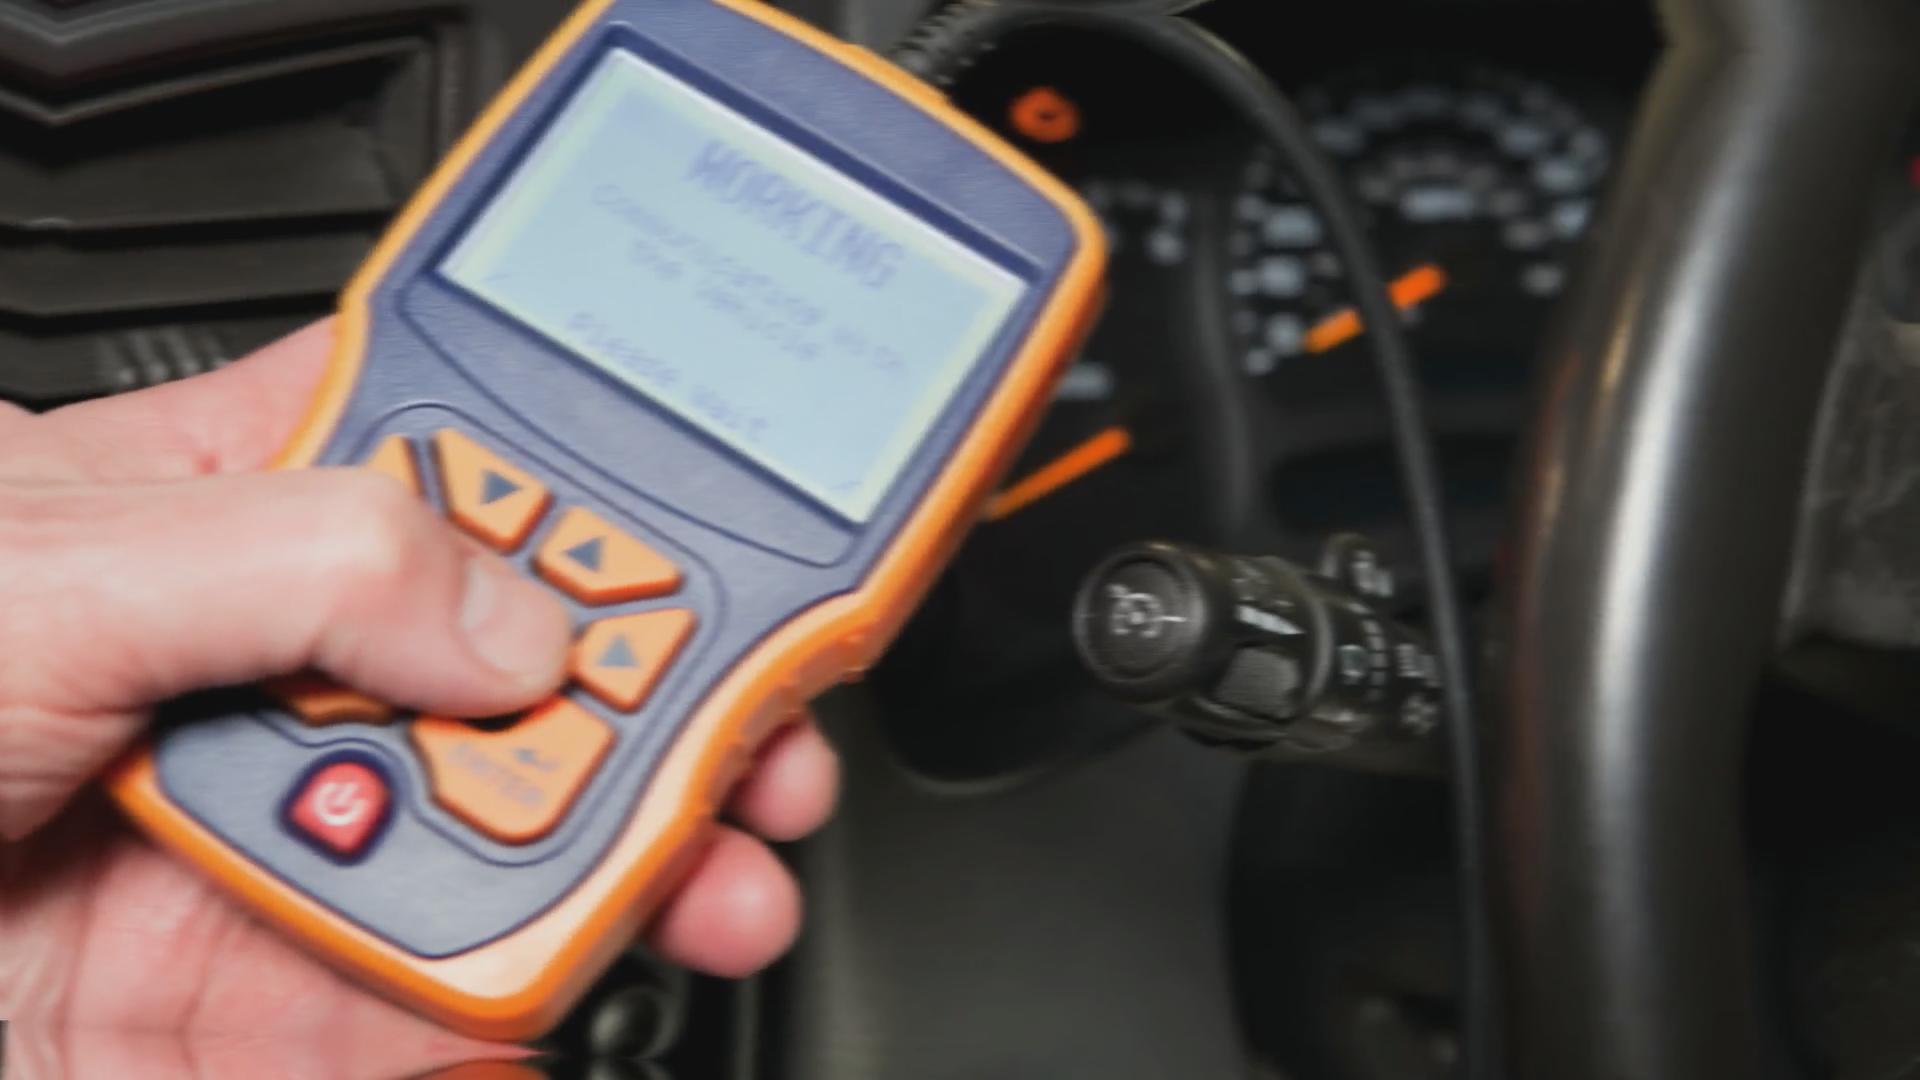 best car code reader for the money